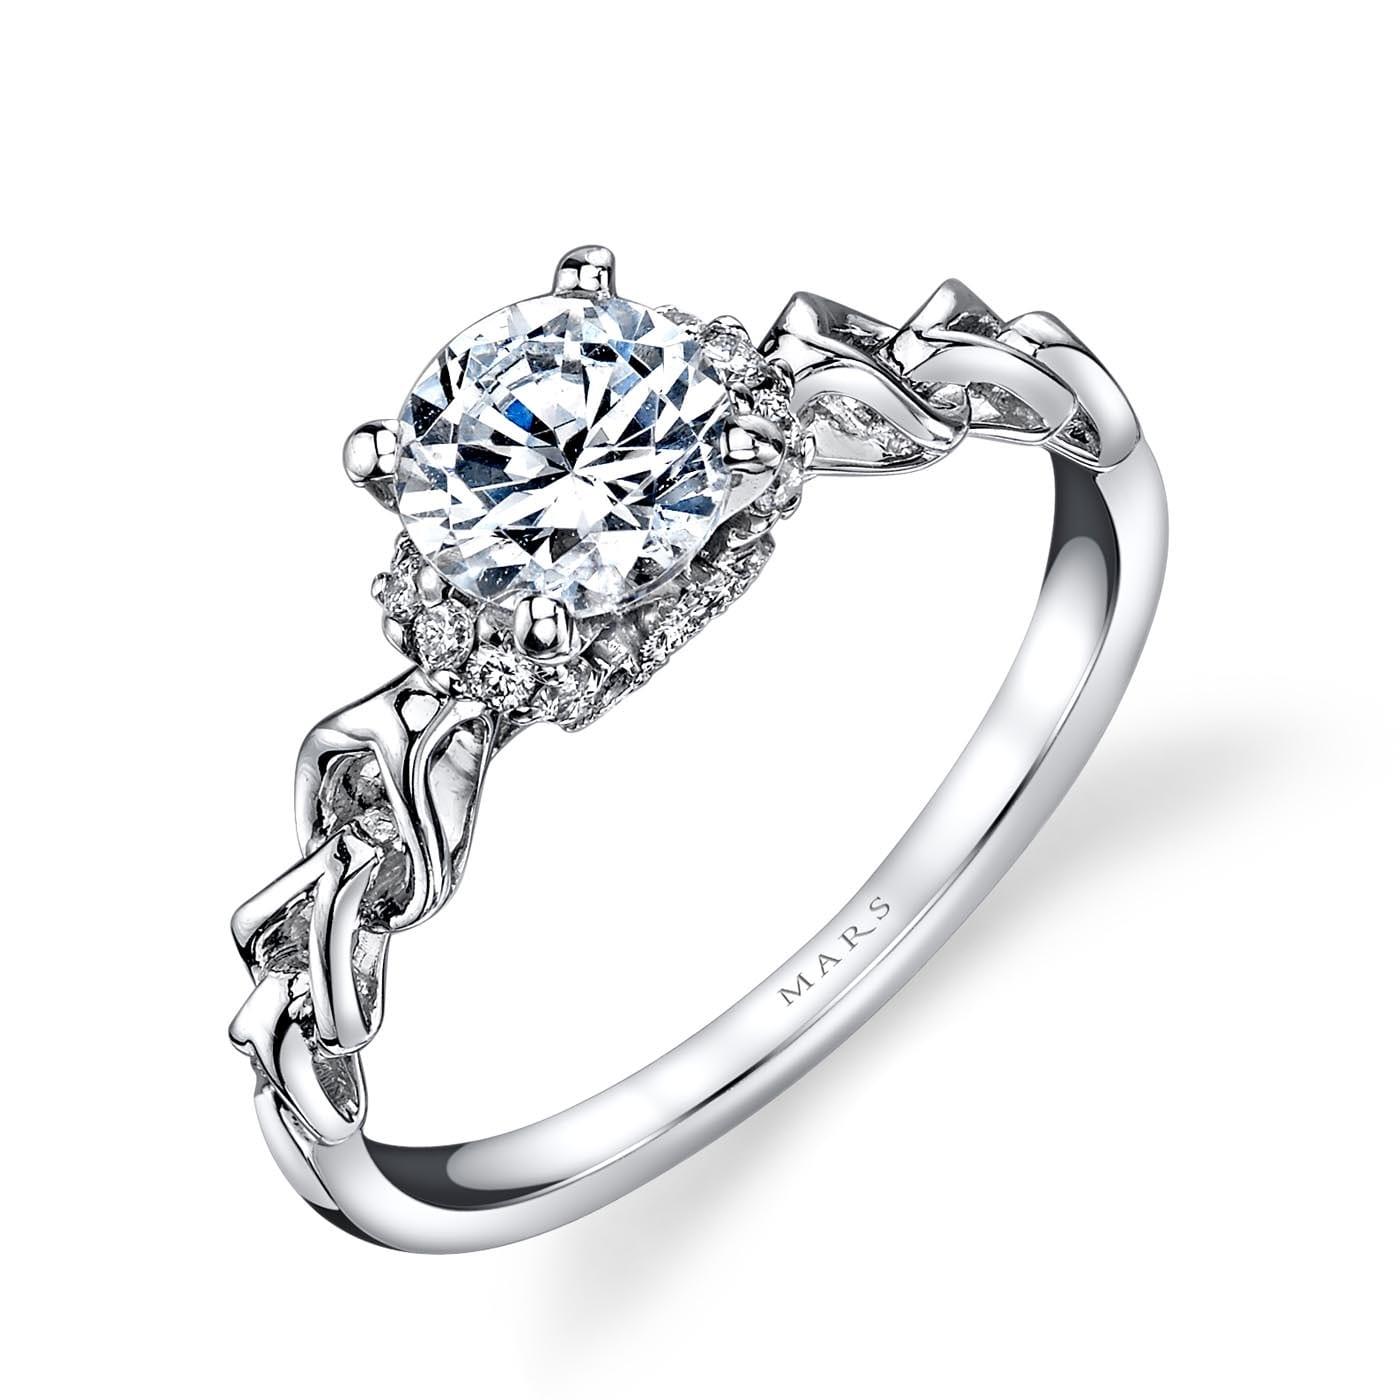 Vintage Engagement RingStyle #: MARS 25847